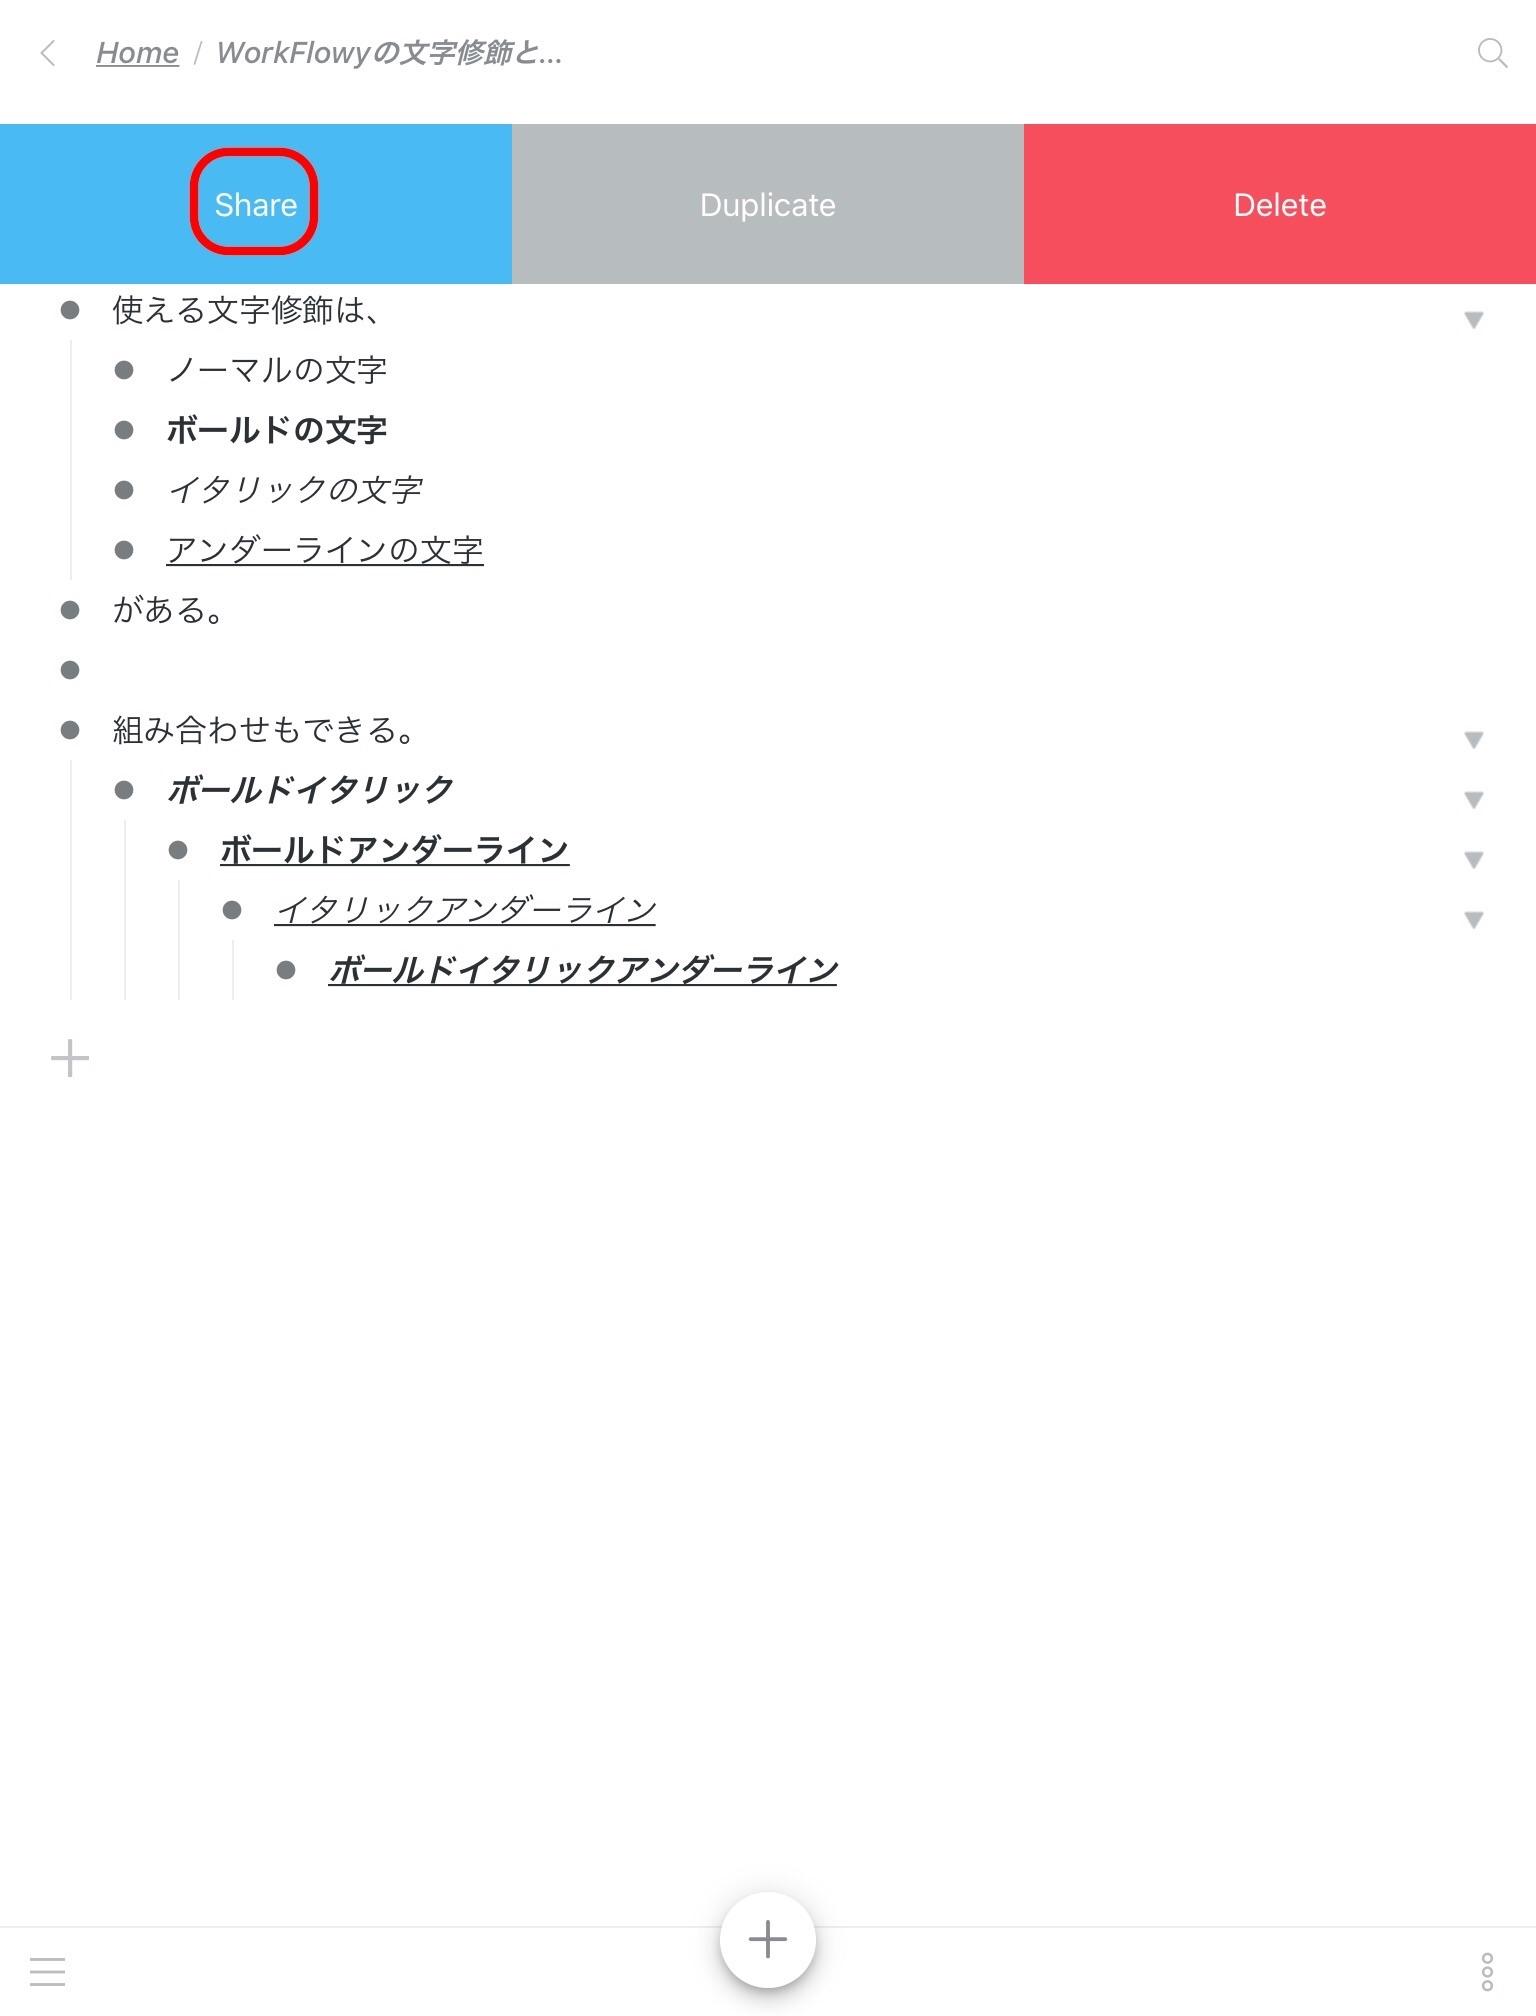 f:id:sorashima:20200731232822j:plain:w637